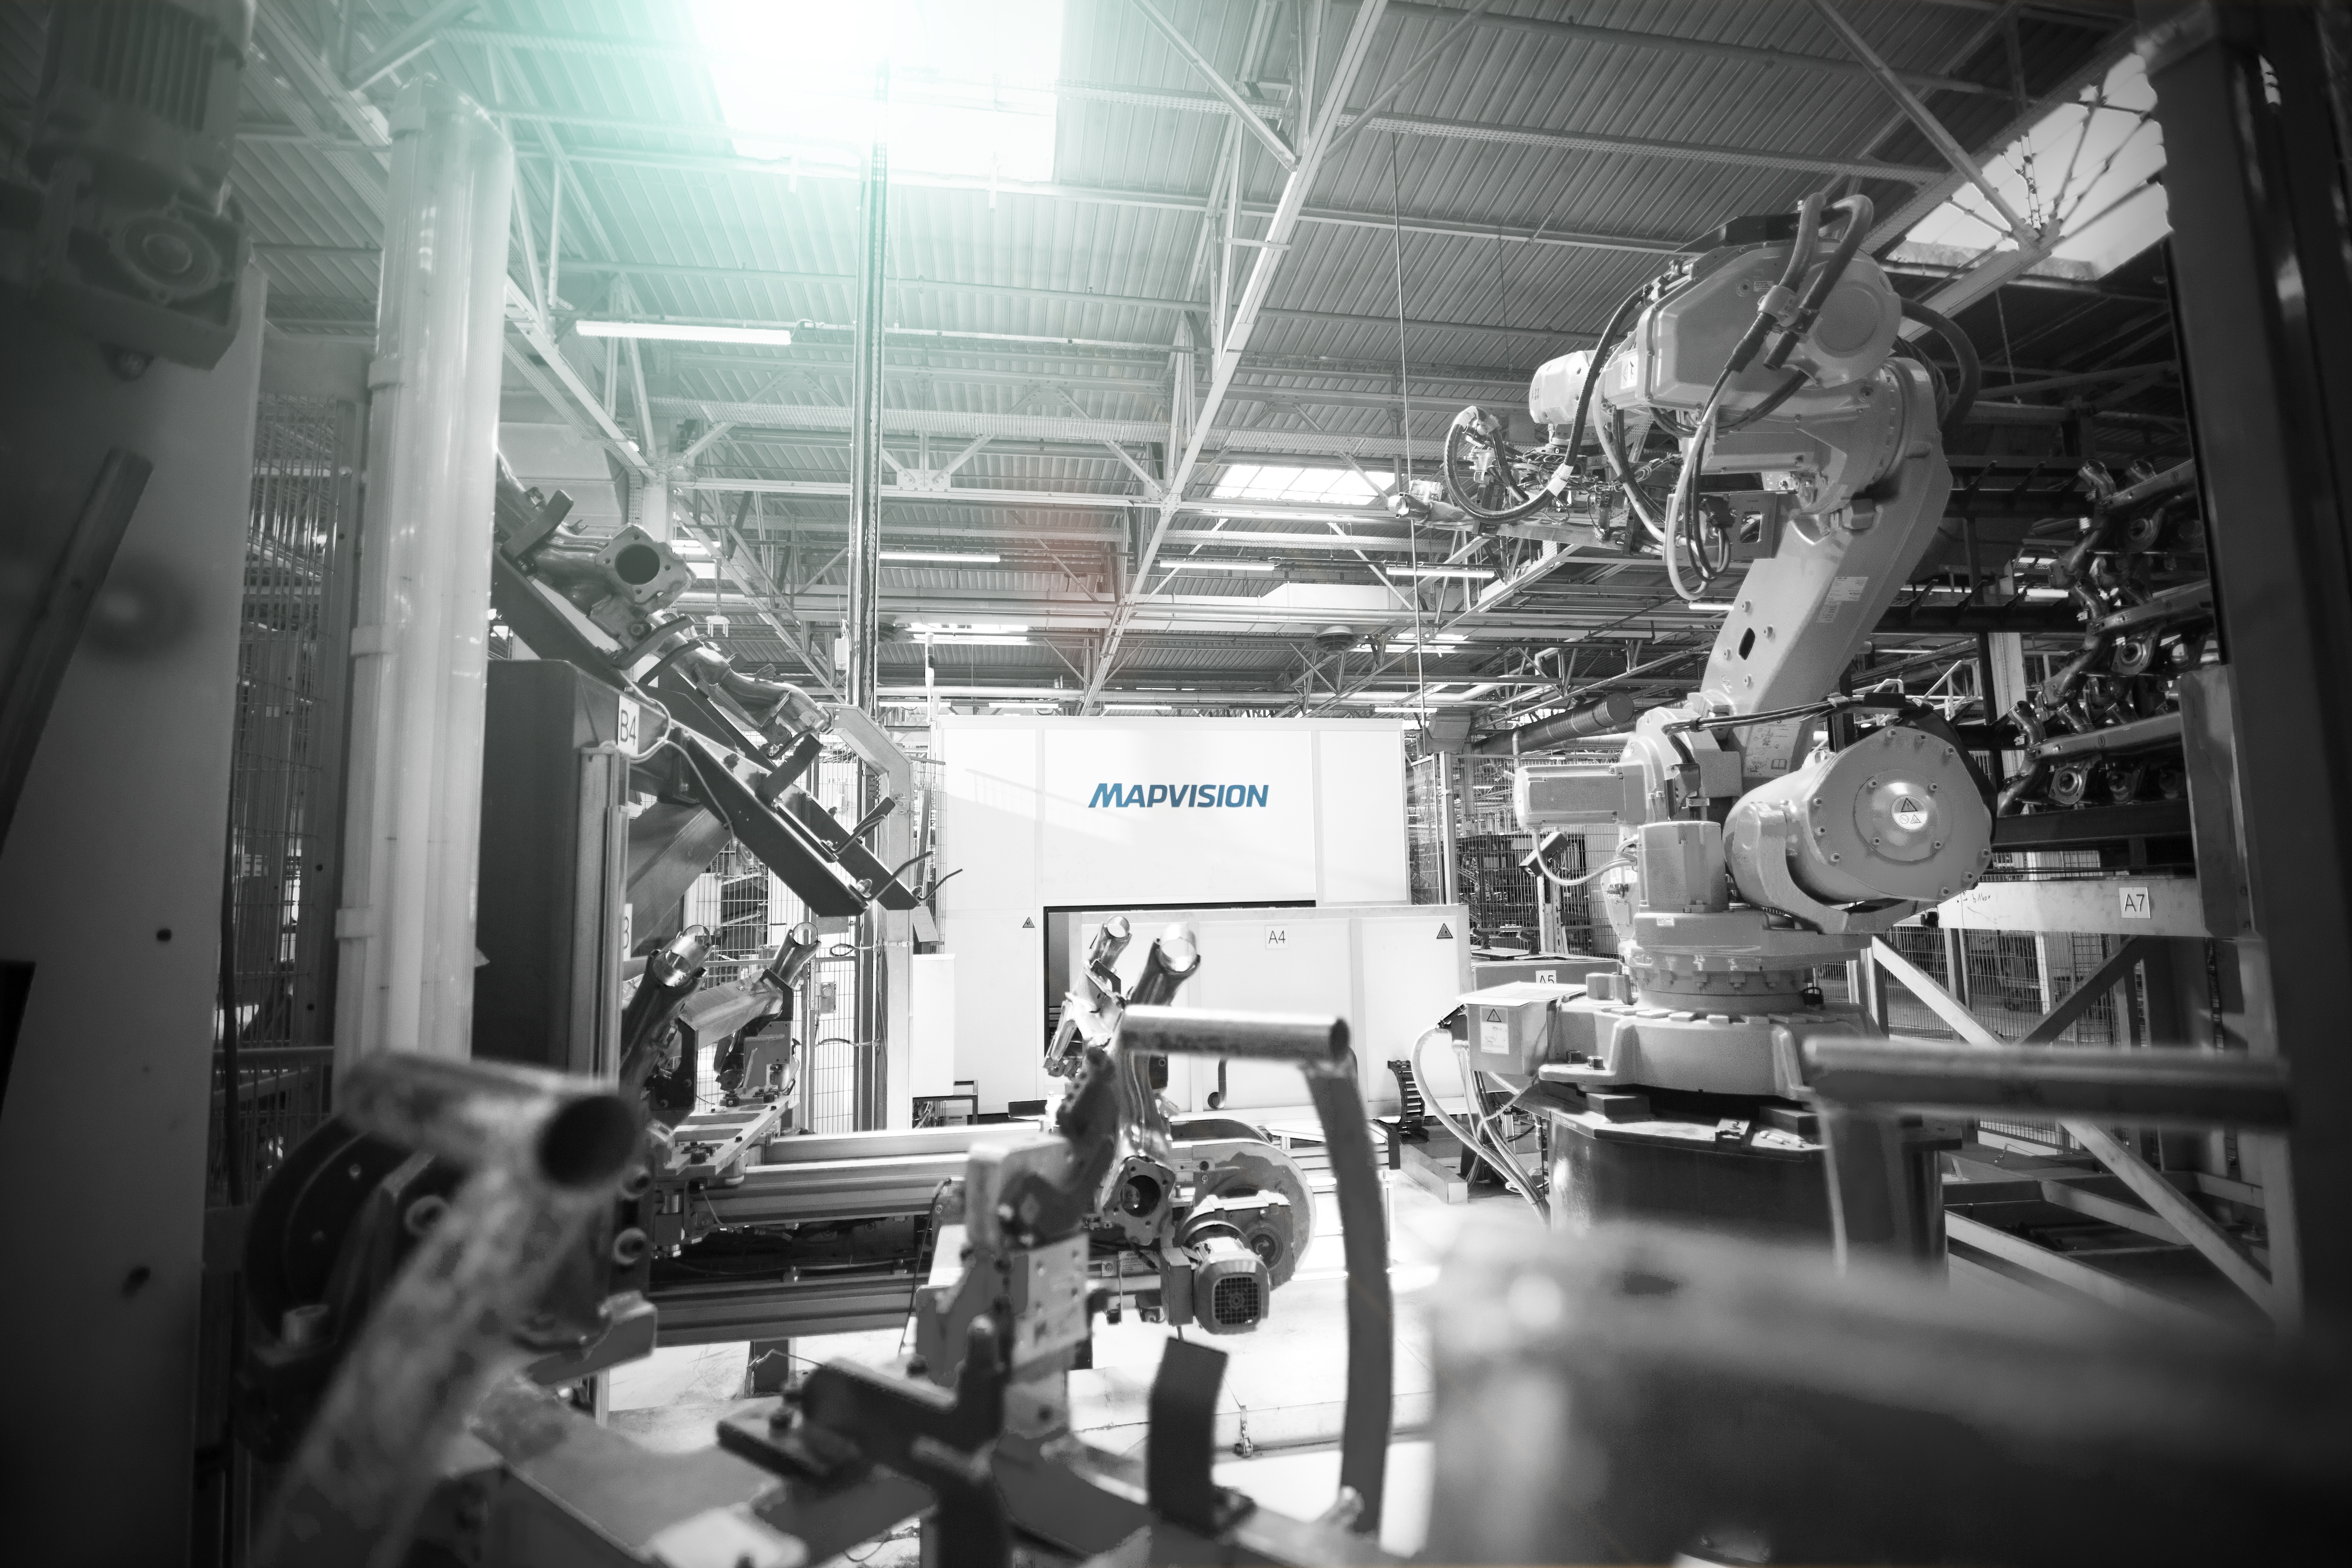 Twist beam axle production hires (6)(1)